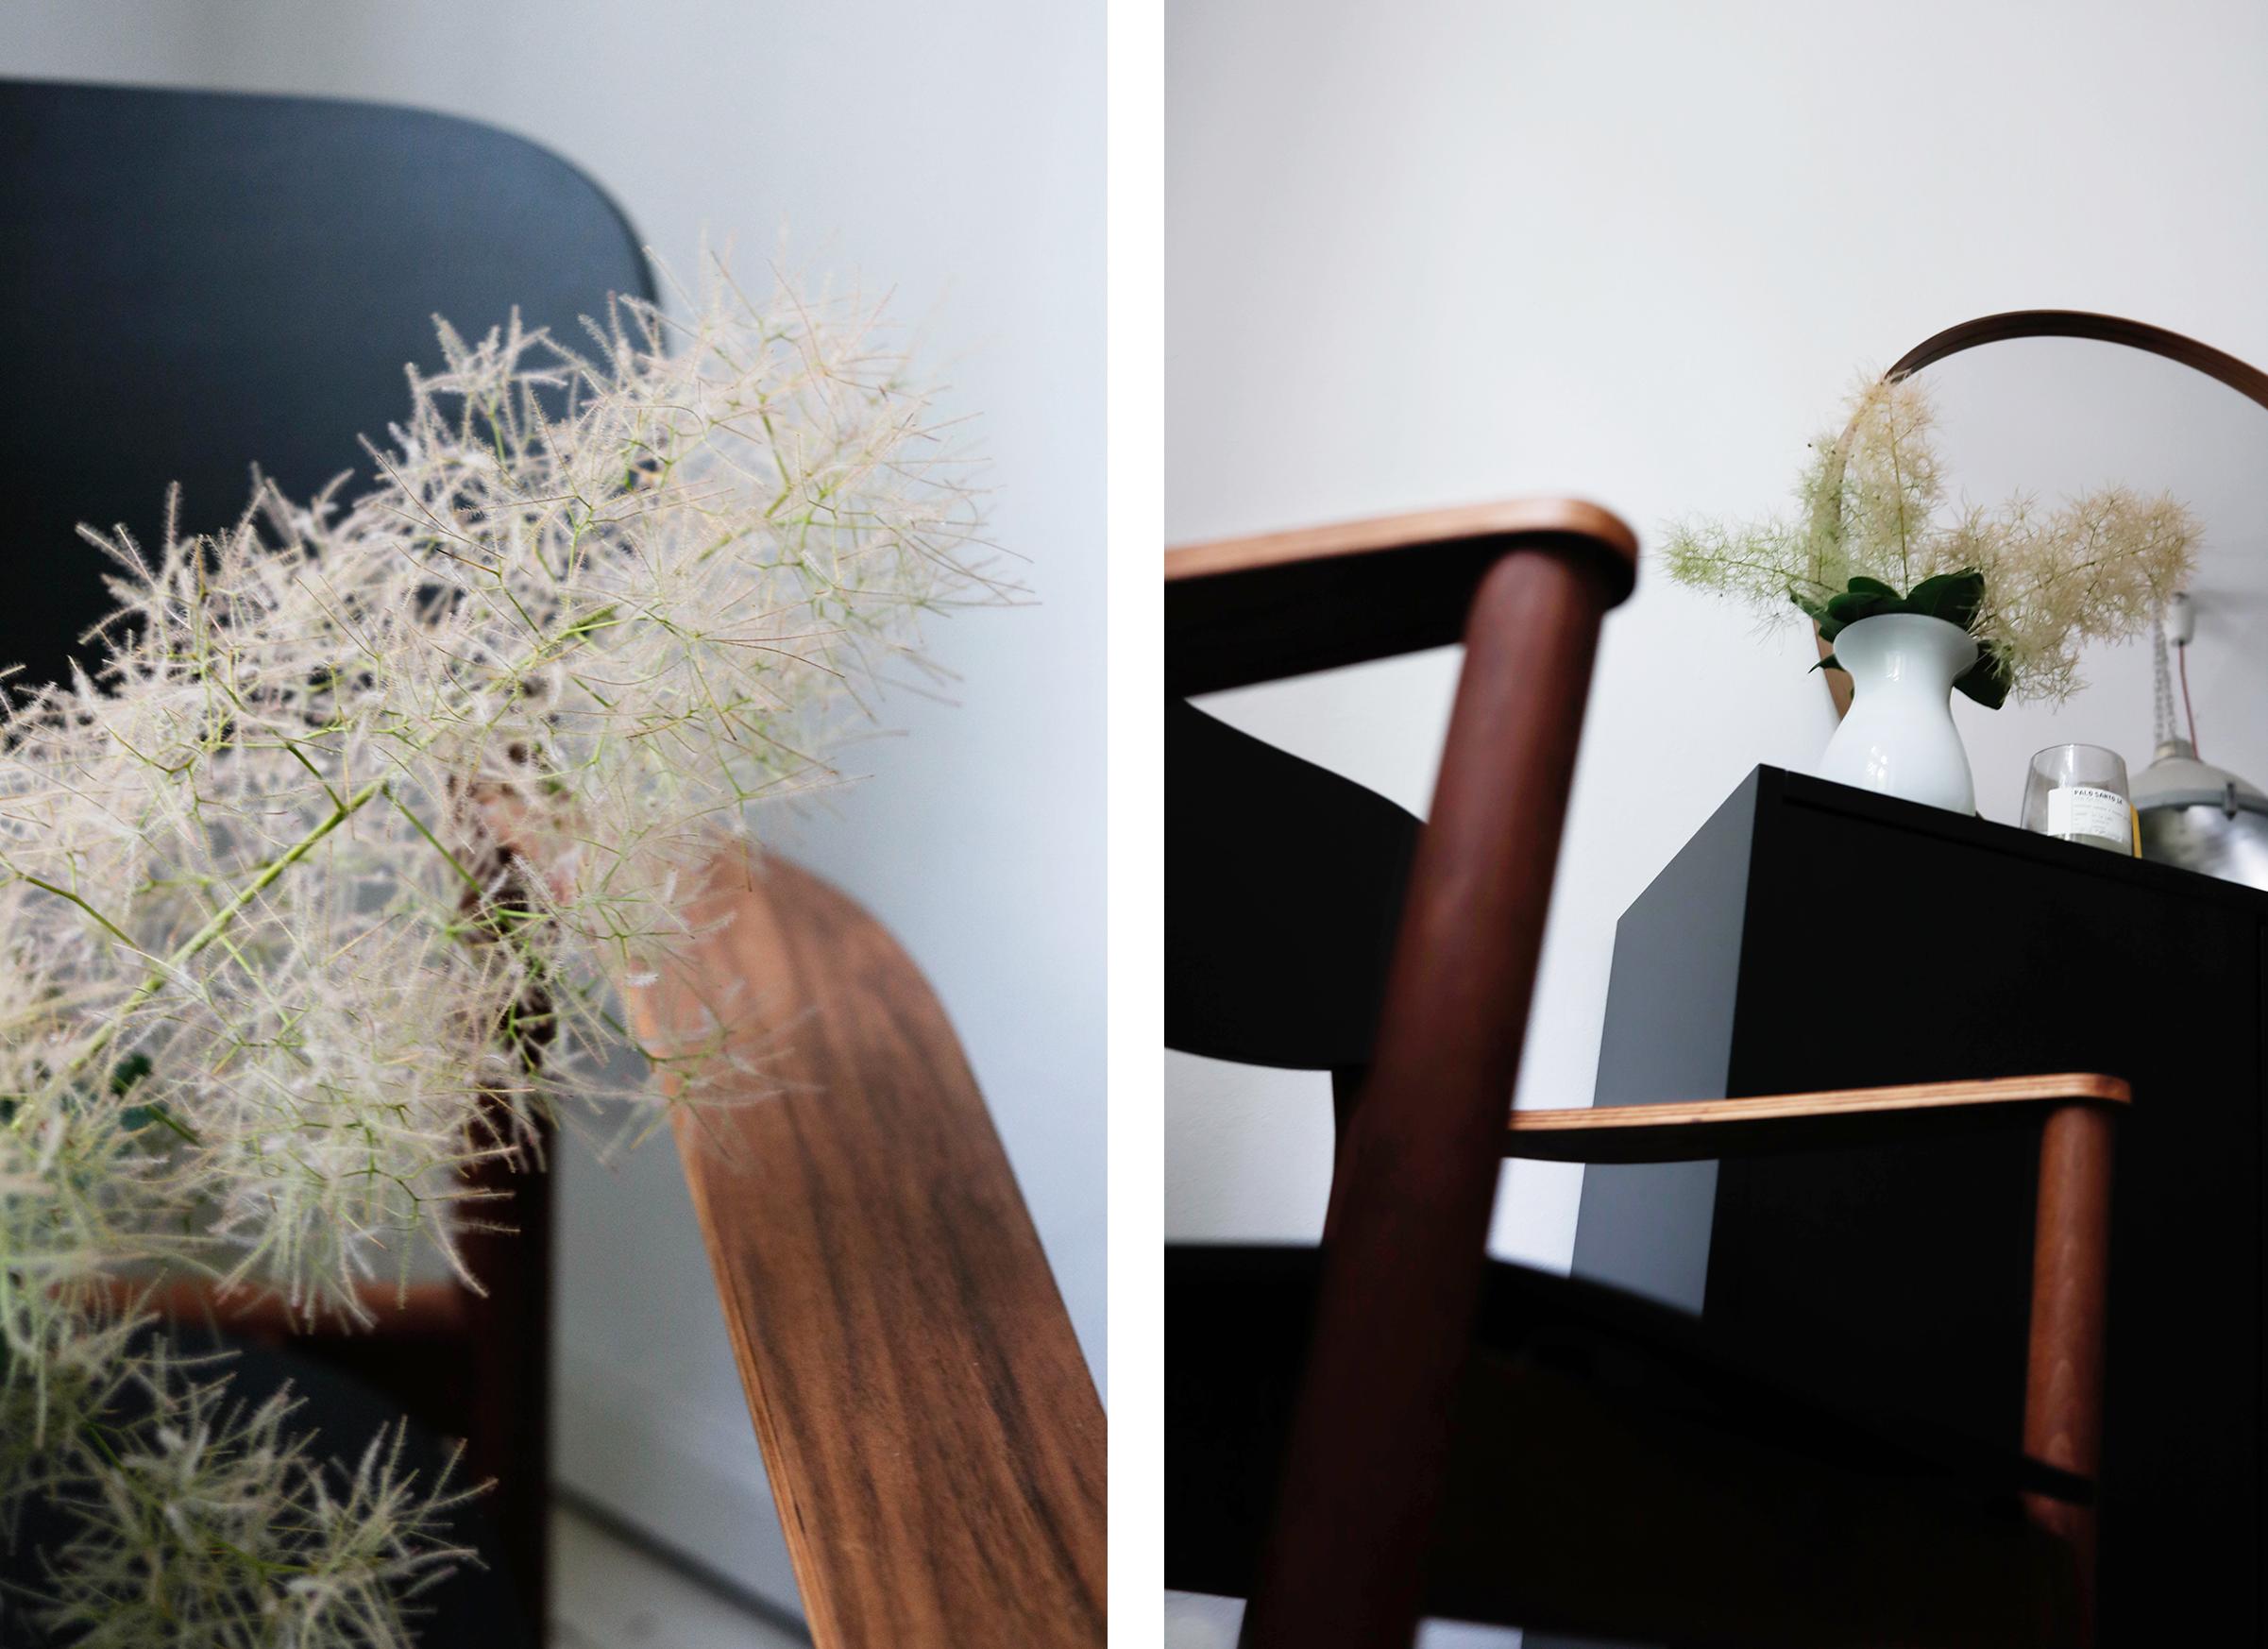 noanoir-minimalist-interior-inspiration-scandinavian-design